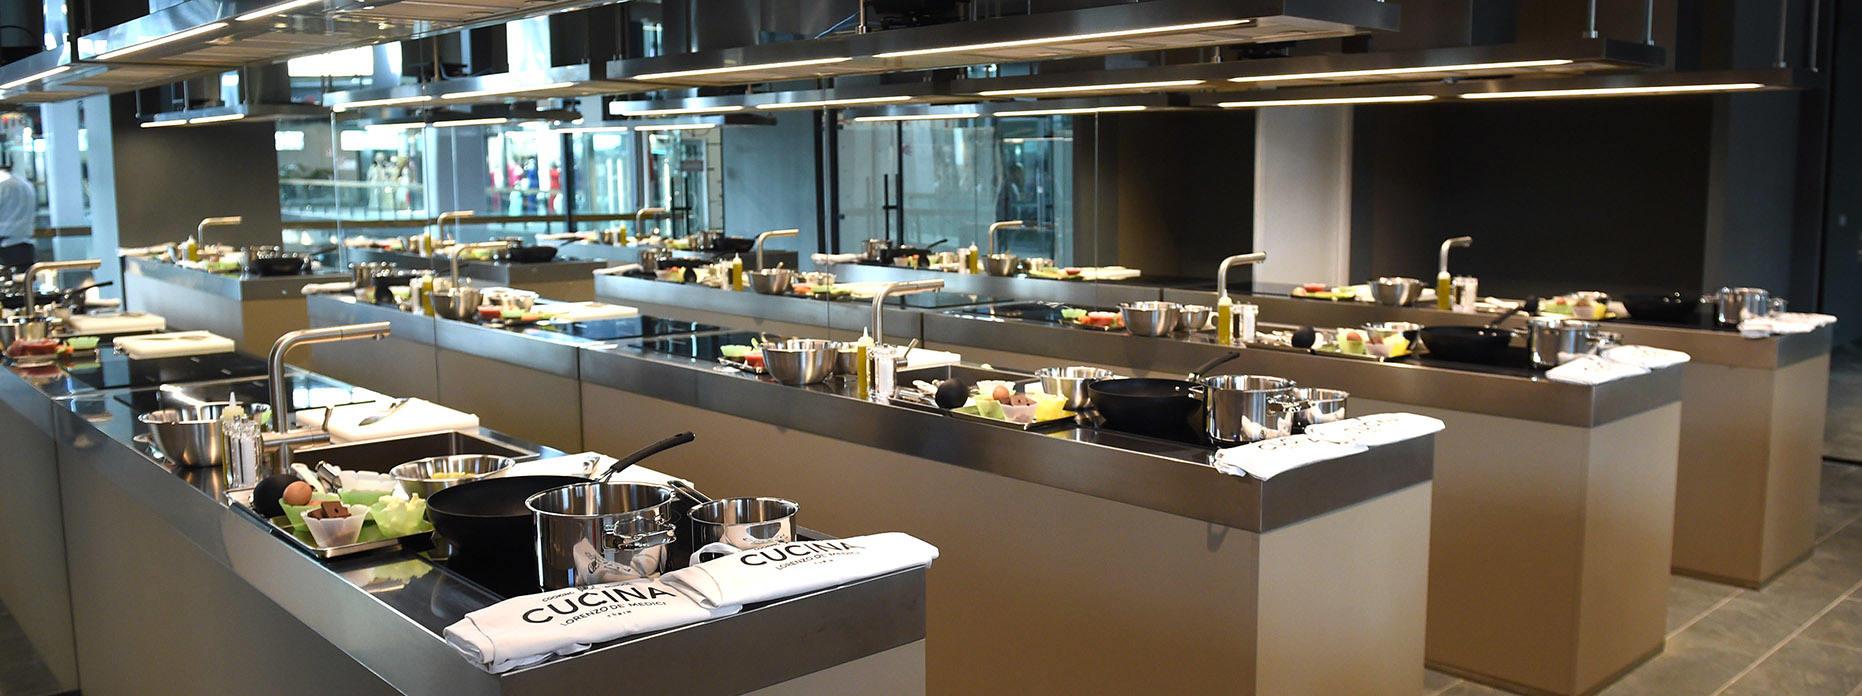 Scuola di cucina Lorenzo de Medici a Torino Kitchen at Lorenzo de Medici Cooking School in Turin